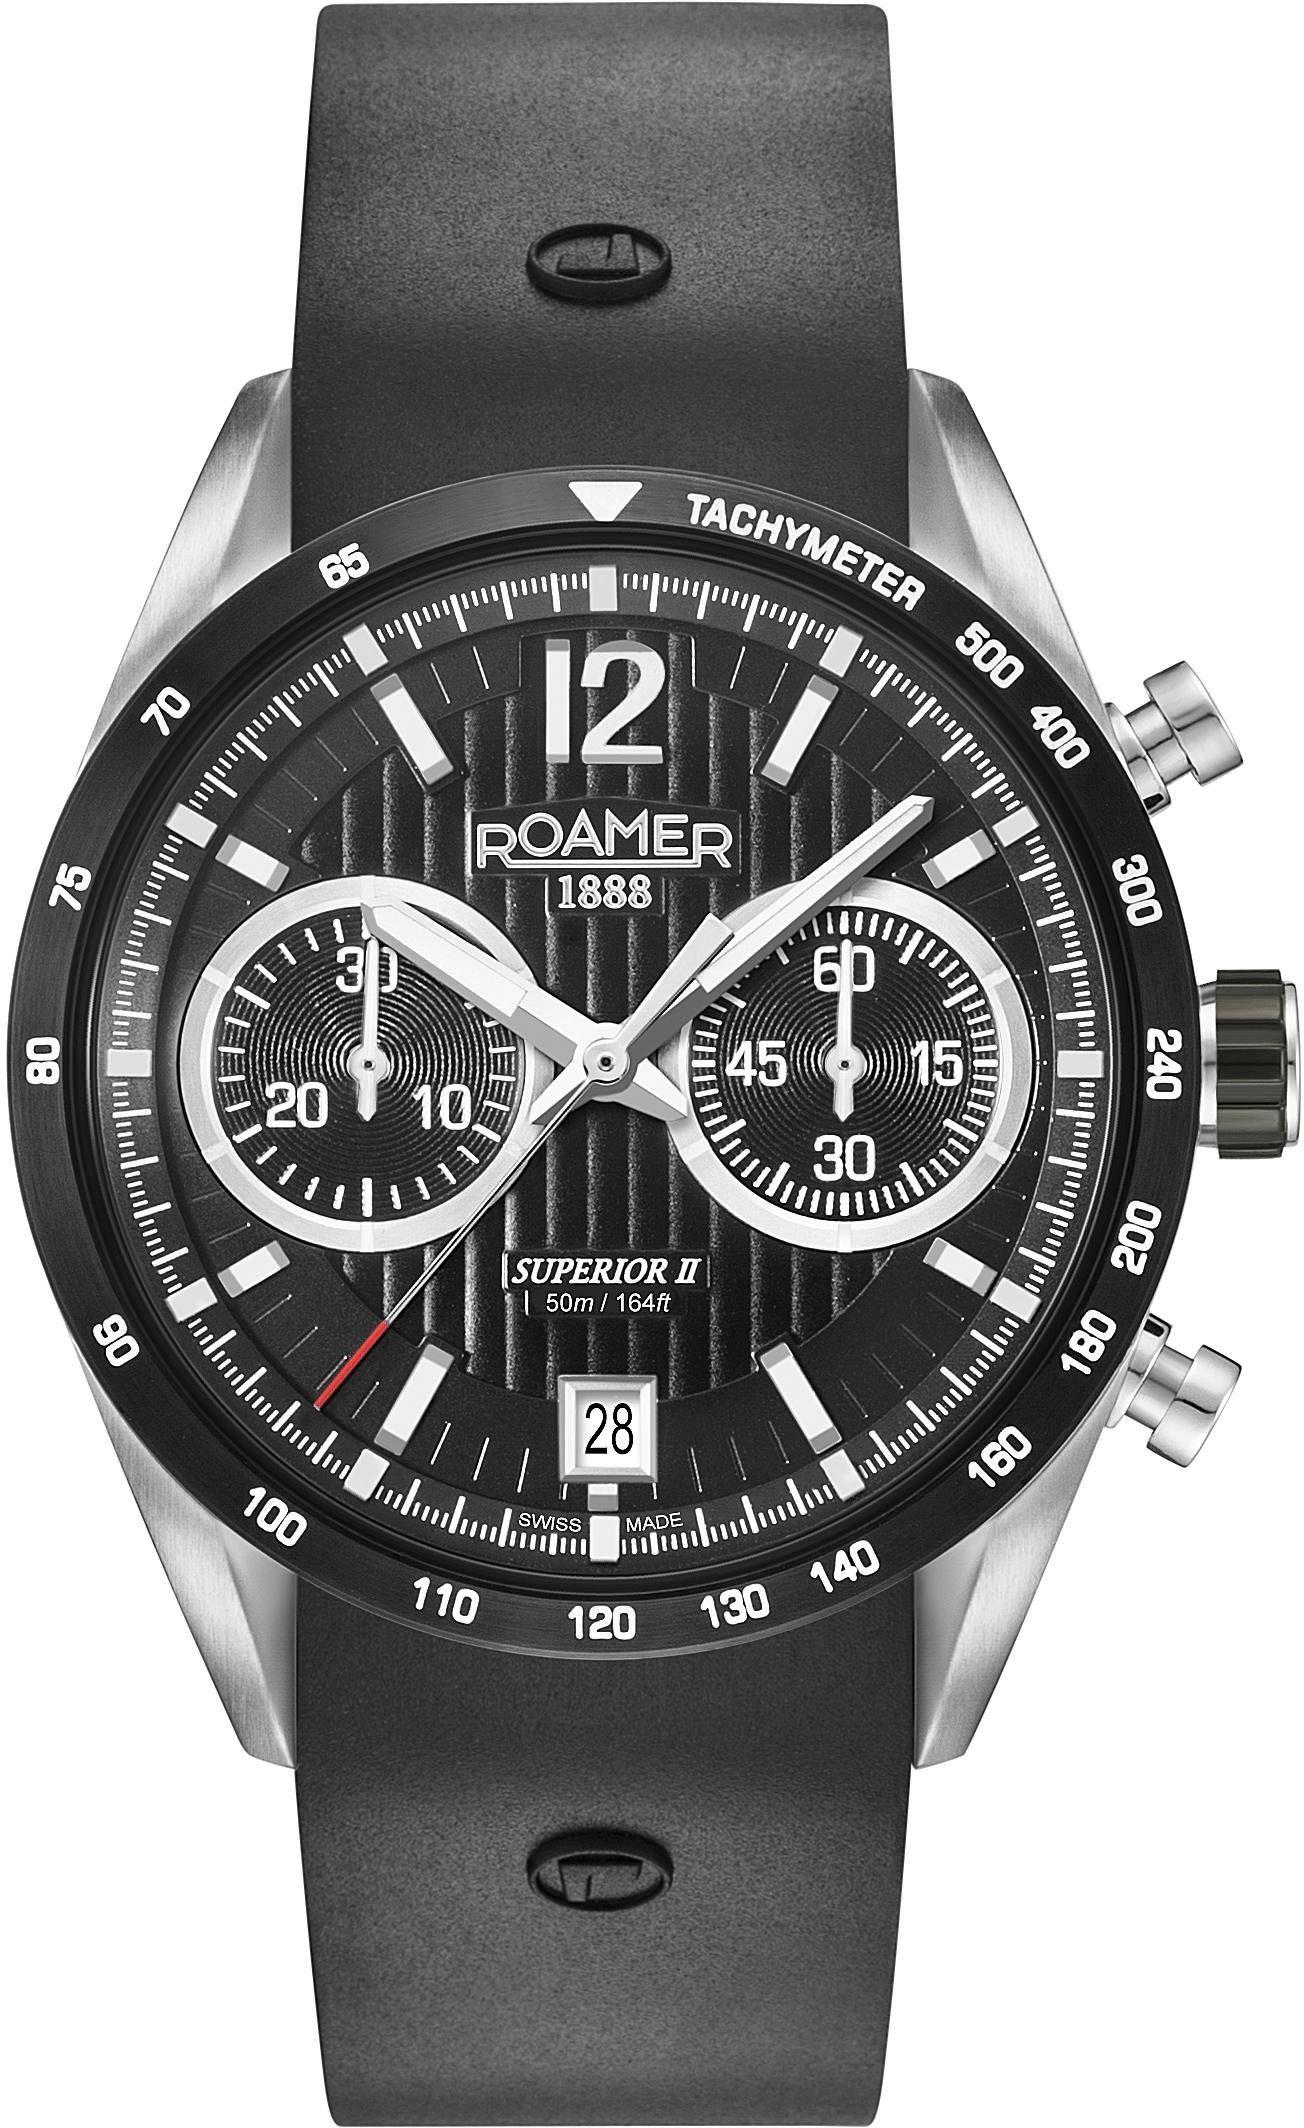 Roamer Chronograph »SUPERIOR CHRONO II, 510902 41 54 05« mit kleiner Sekunde